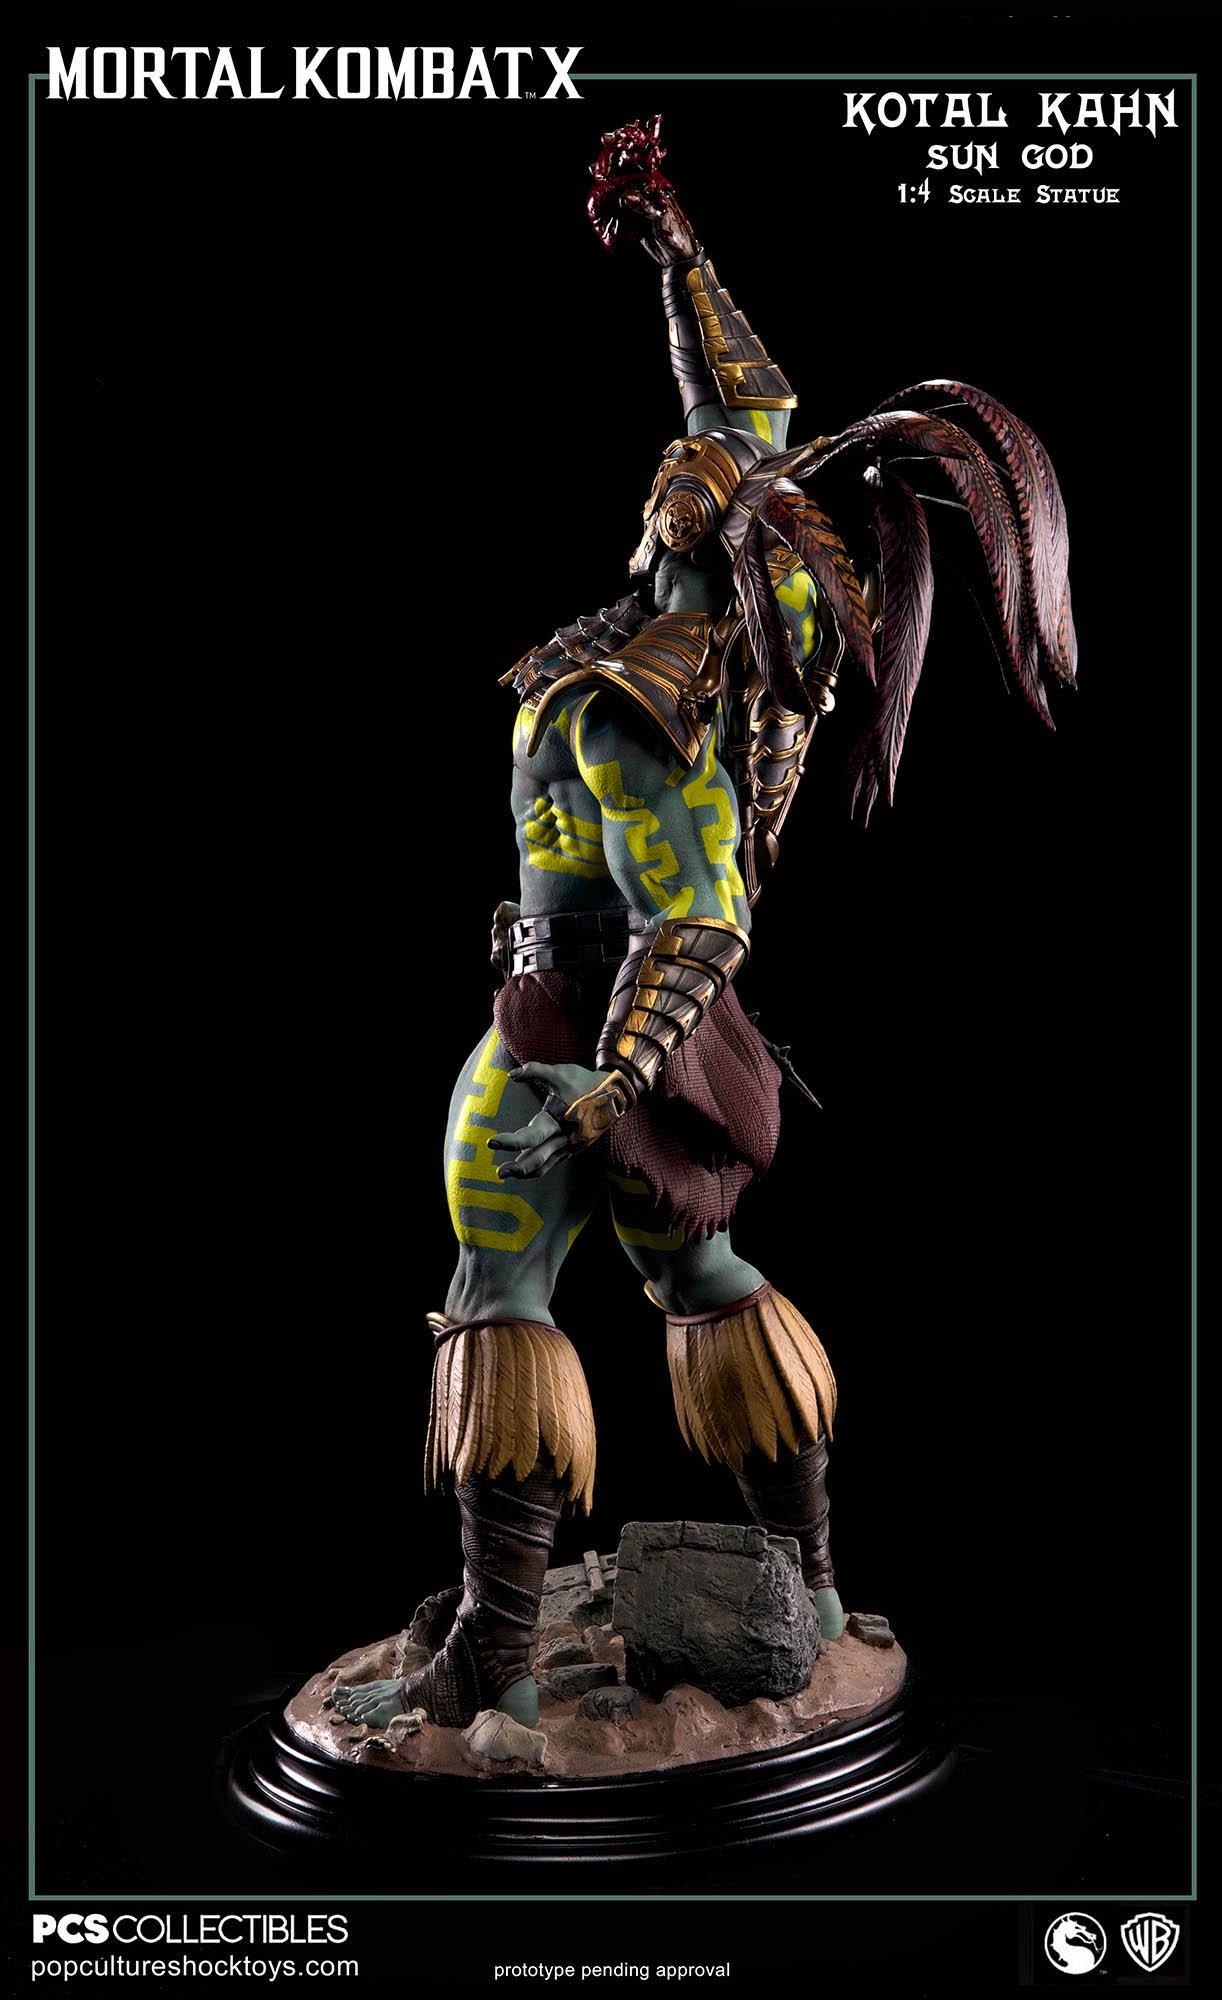 [Pop Culture Shock] Mortal Kombat X: Kotal Kahn 1:4 scale PCS-Kotal-Kahn-Sun-God-013